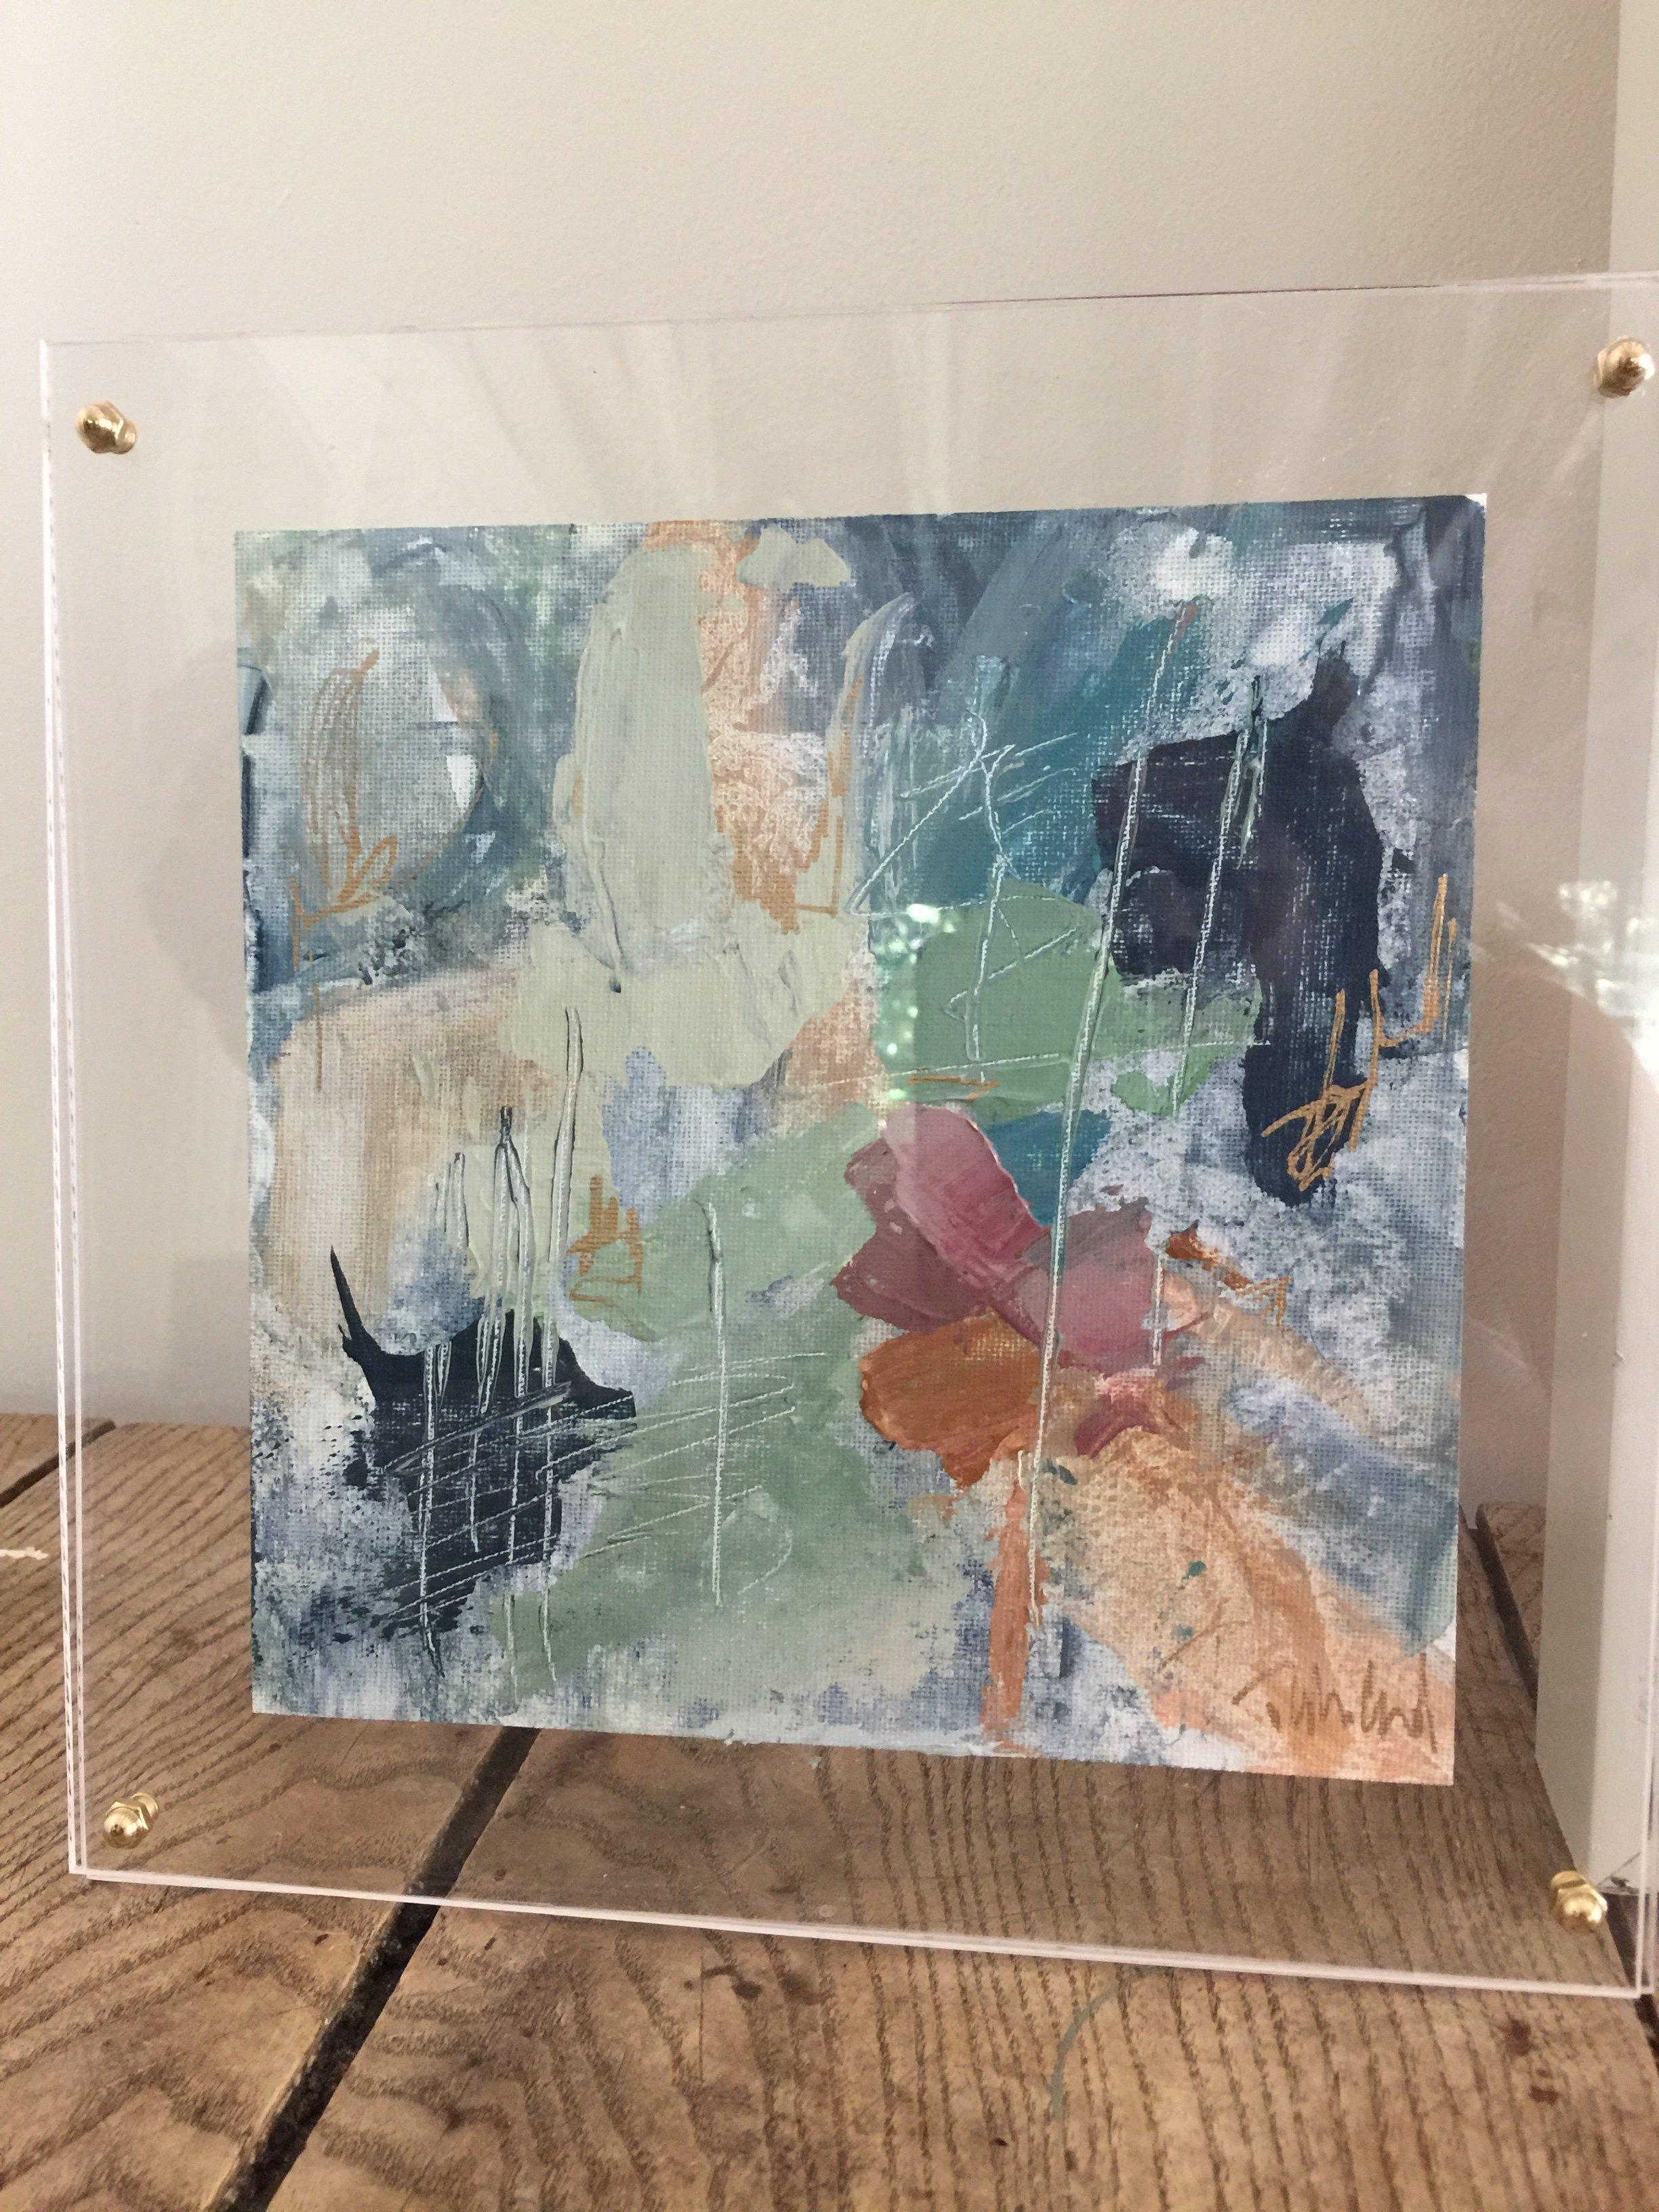 Vibe - Tyler Colgan. 10.5 x 10.5 inches. Acrylic and mixed media on ...